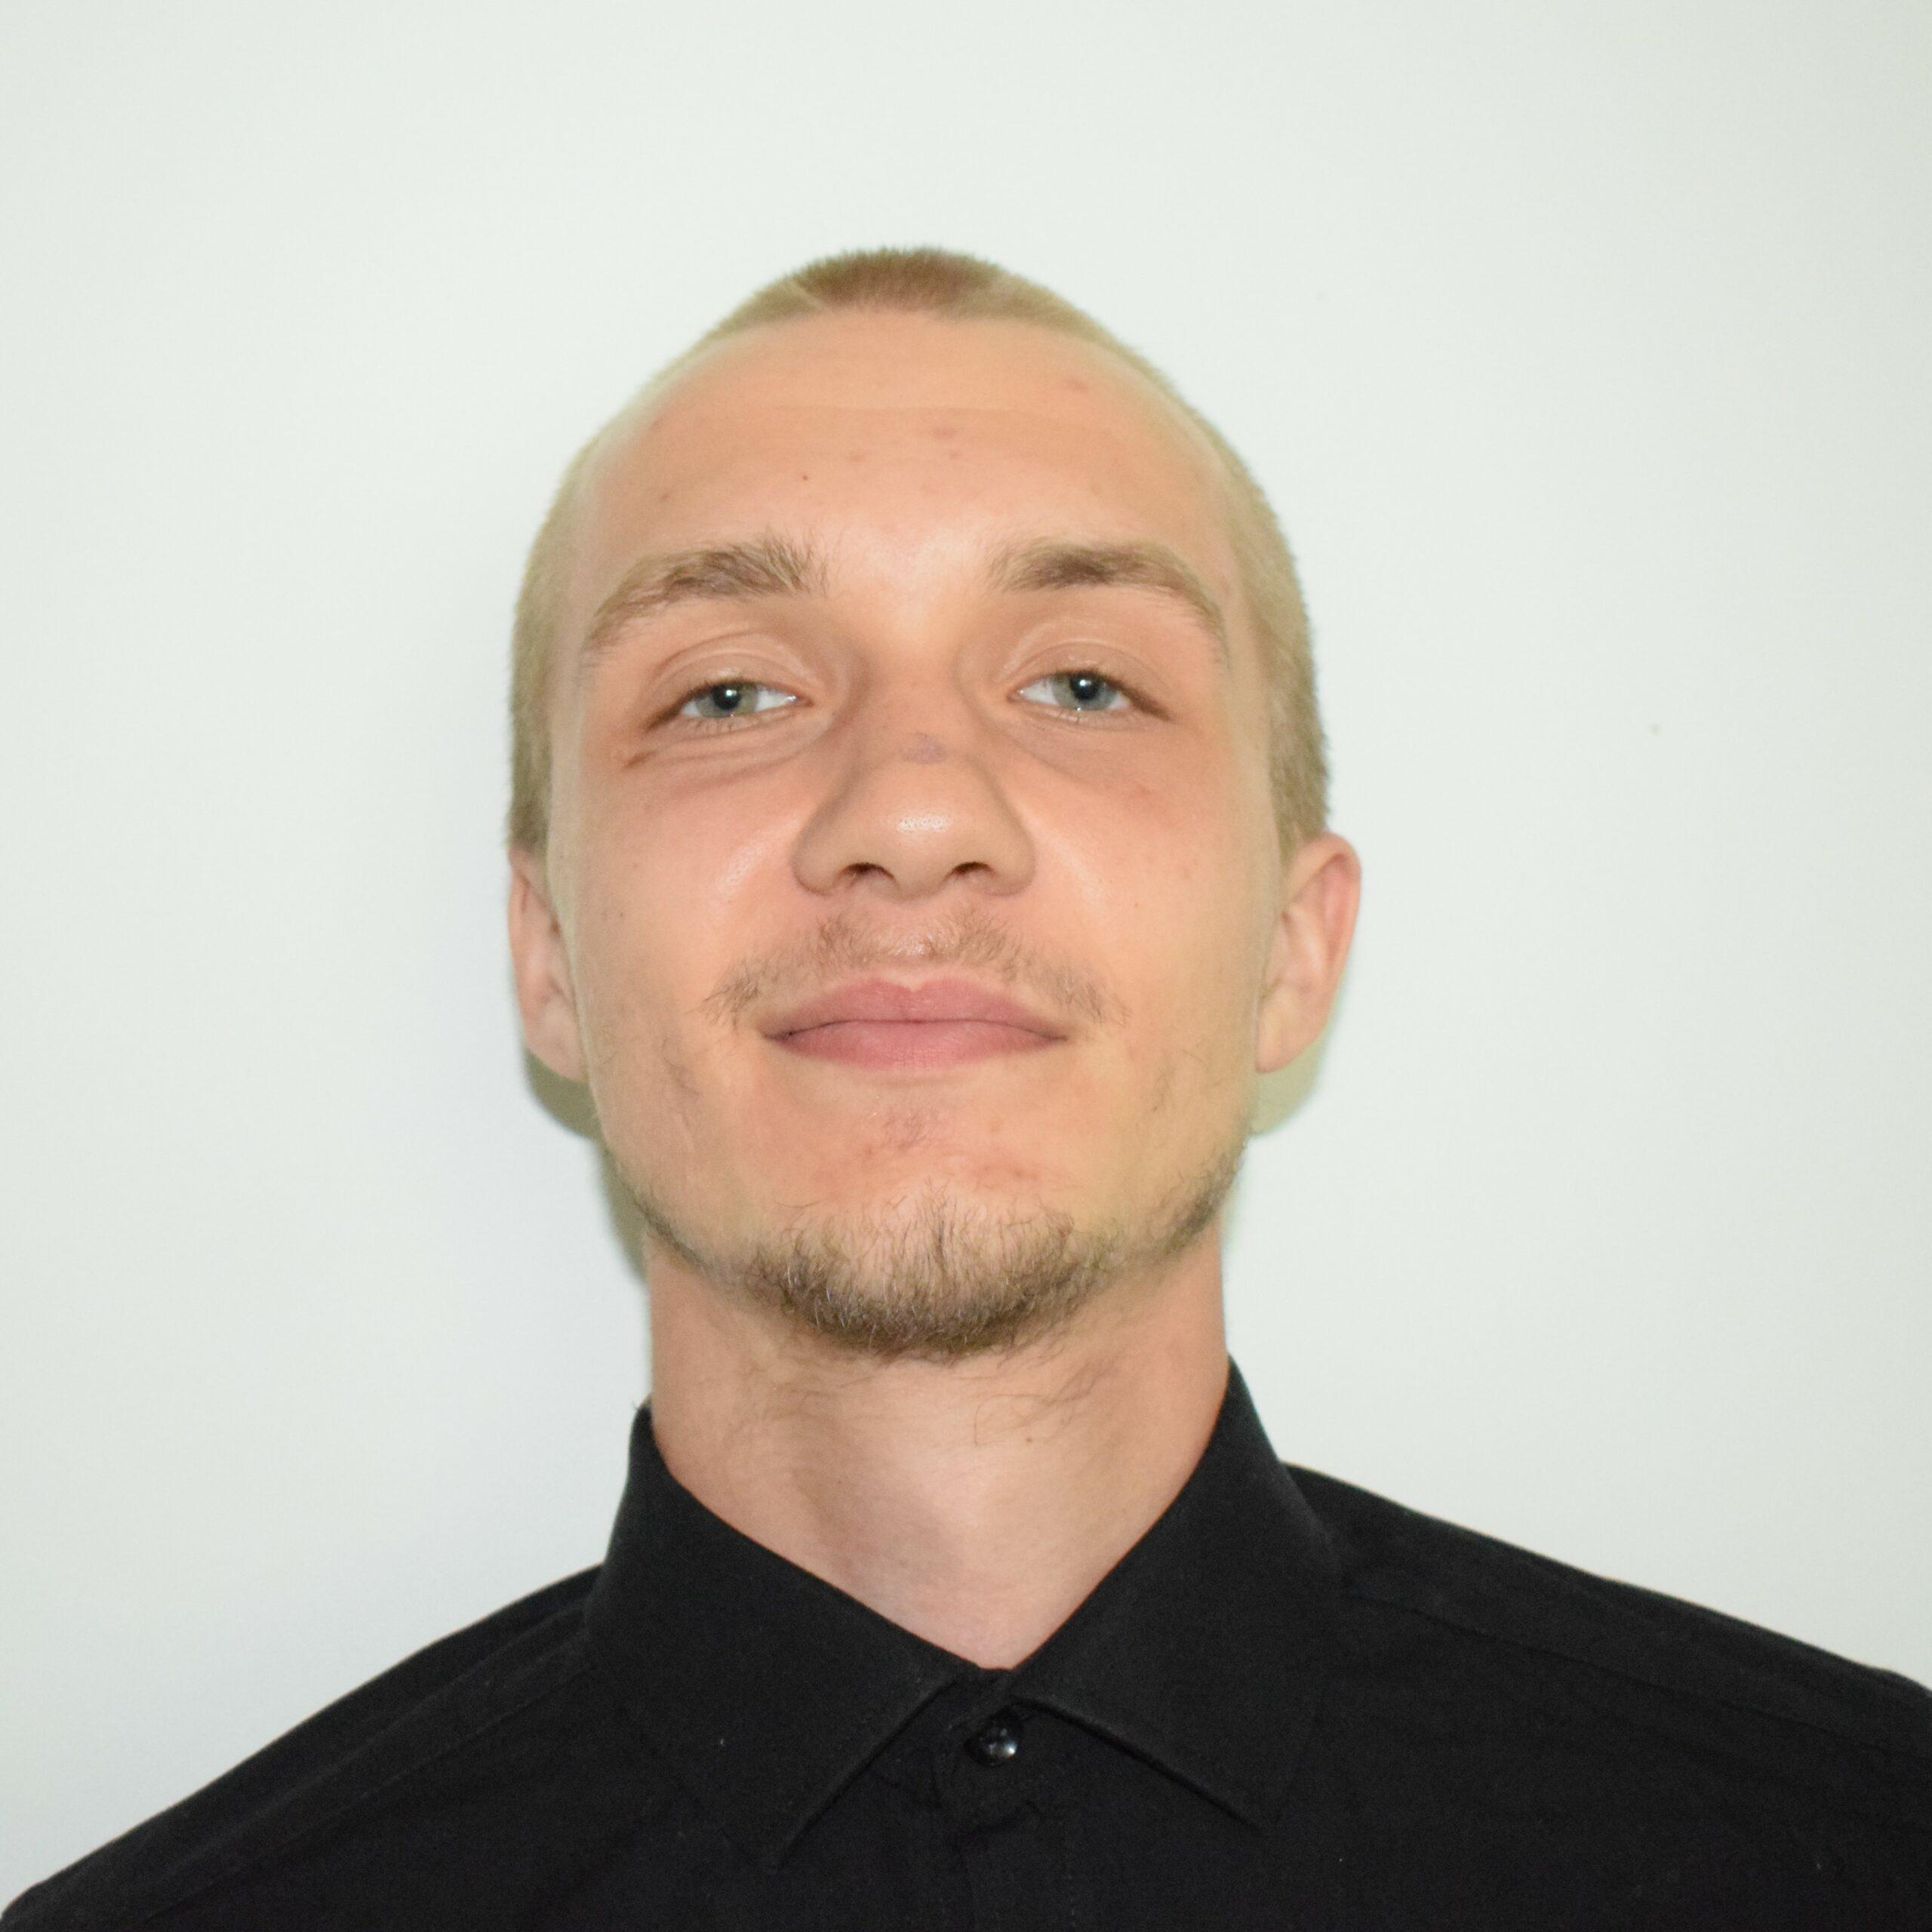 profile picture of Jakub Izydorczyk